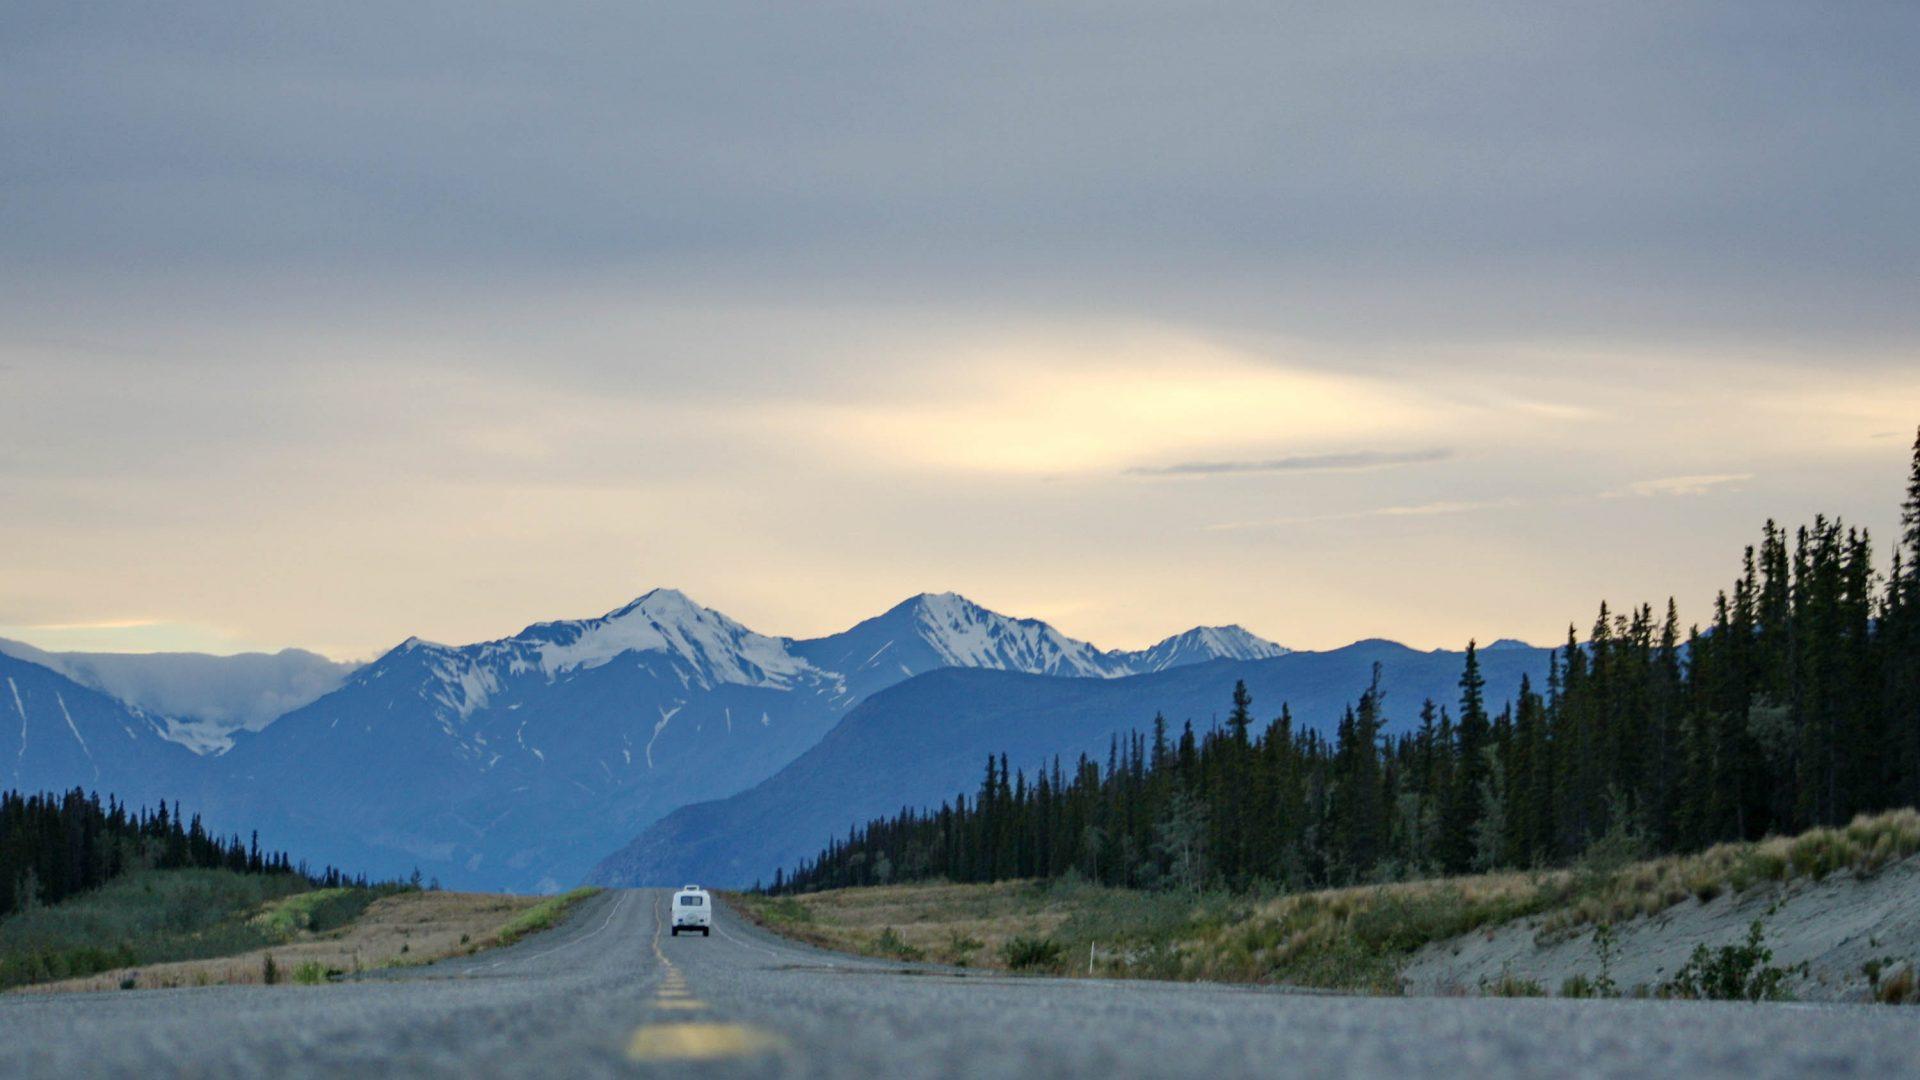 A van drives down the road in Alaska, USA.